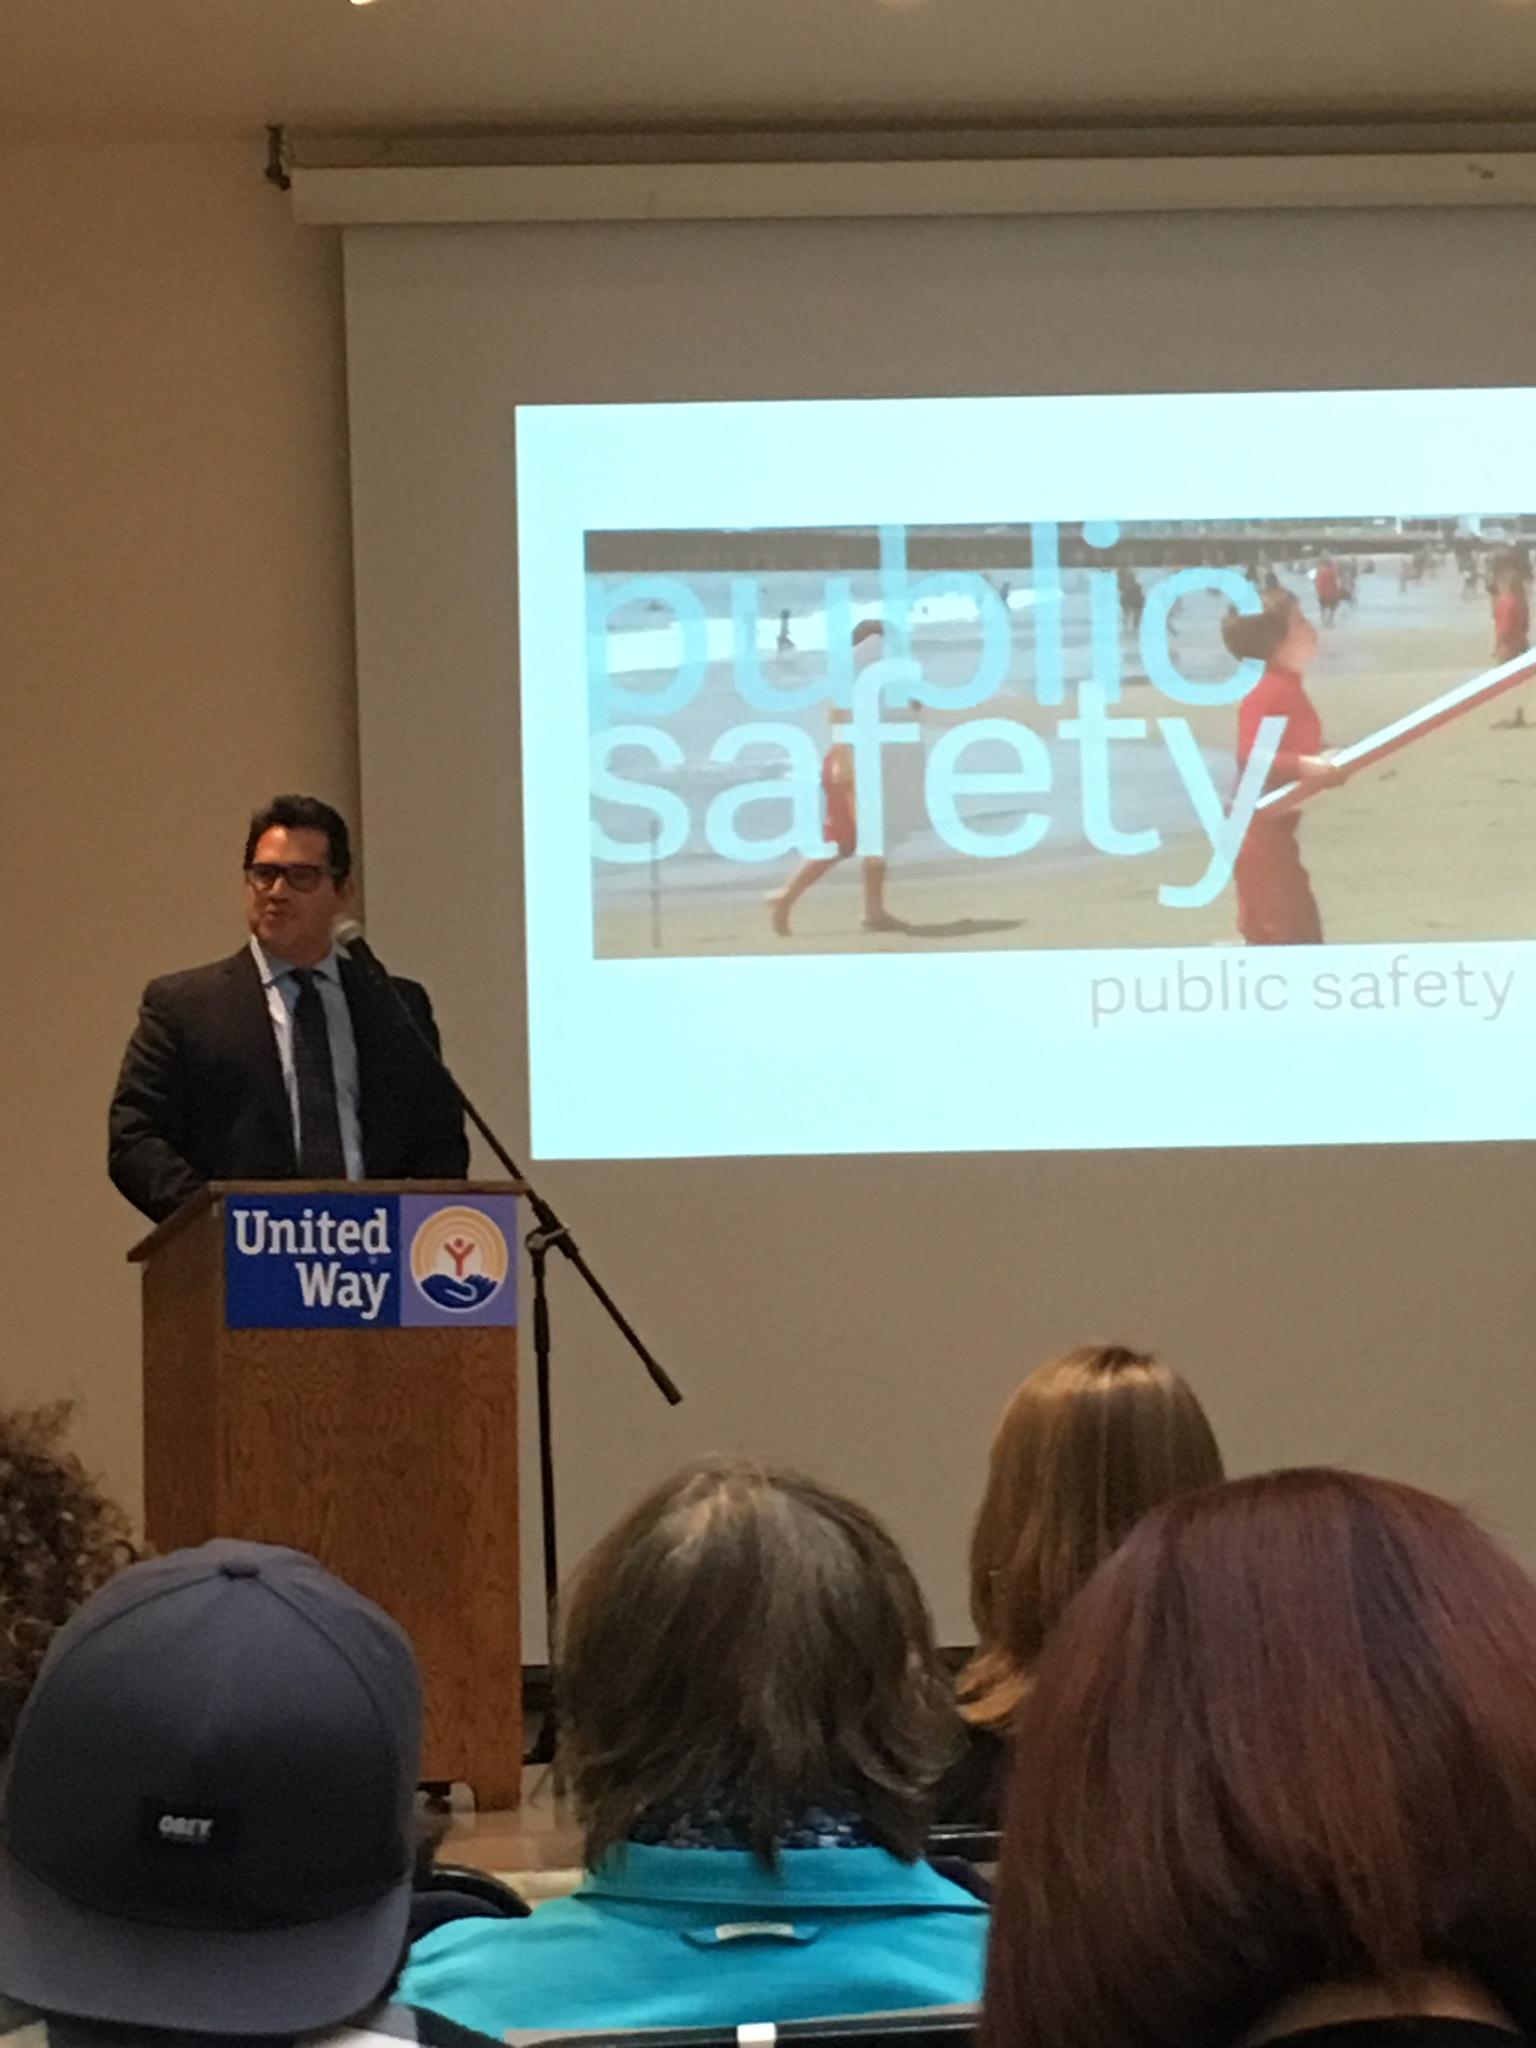 Director of Santa Cruz County Probation Department Fernando Giraldo presenting the public safety findings.